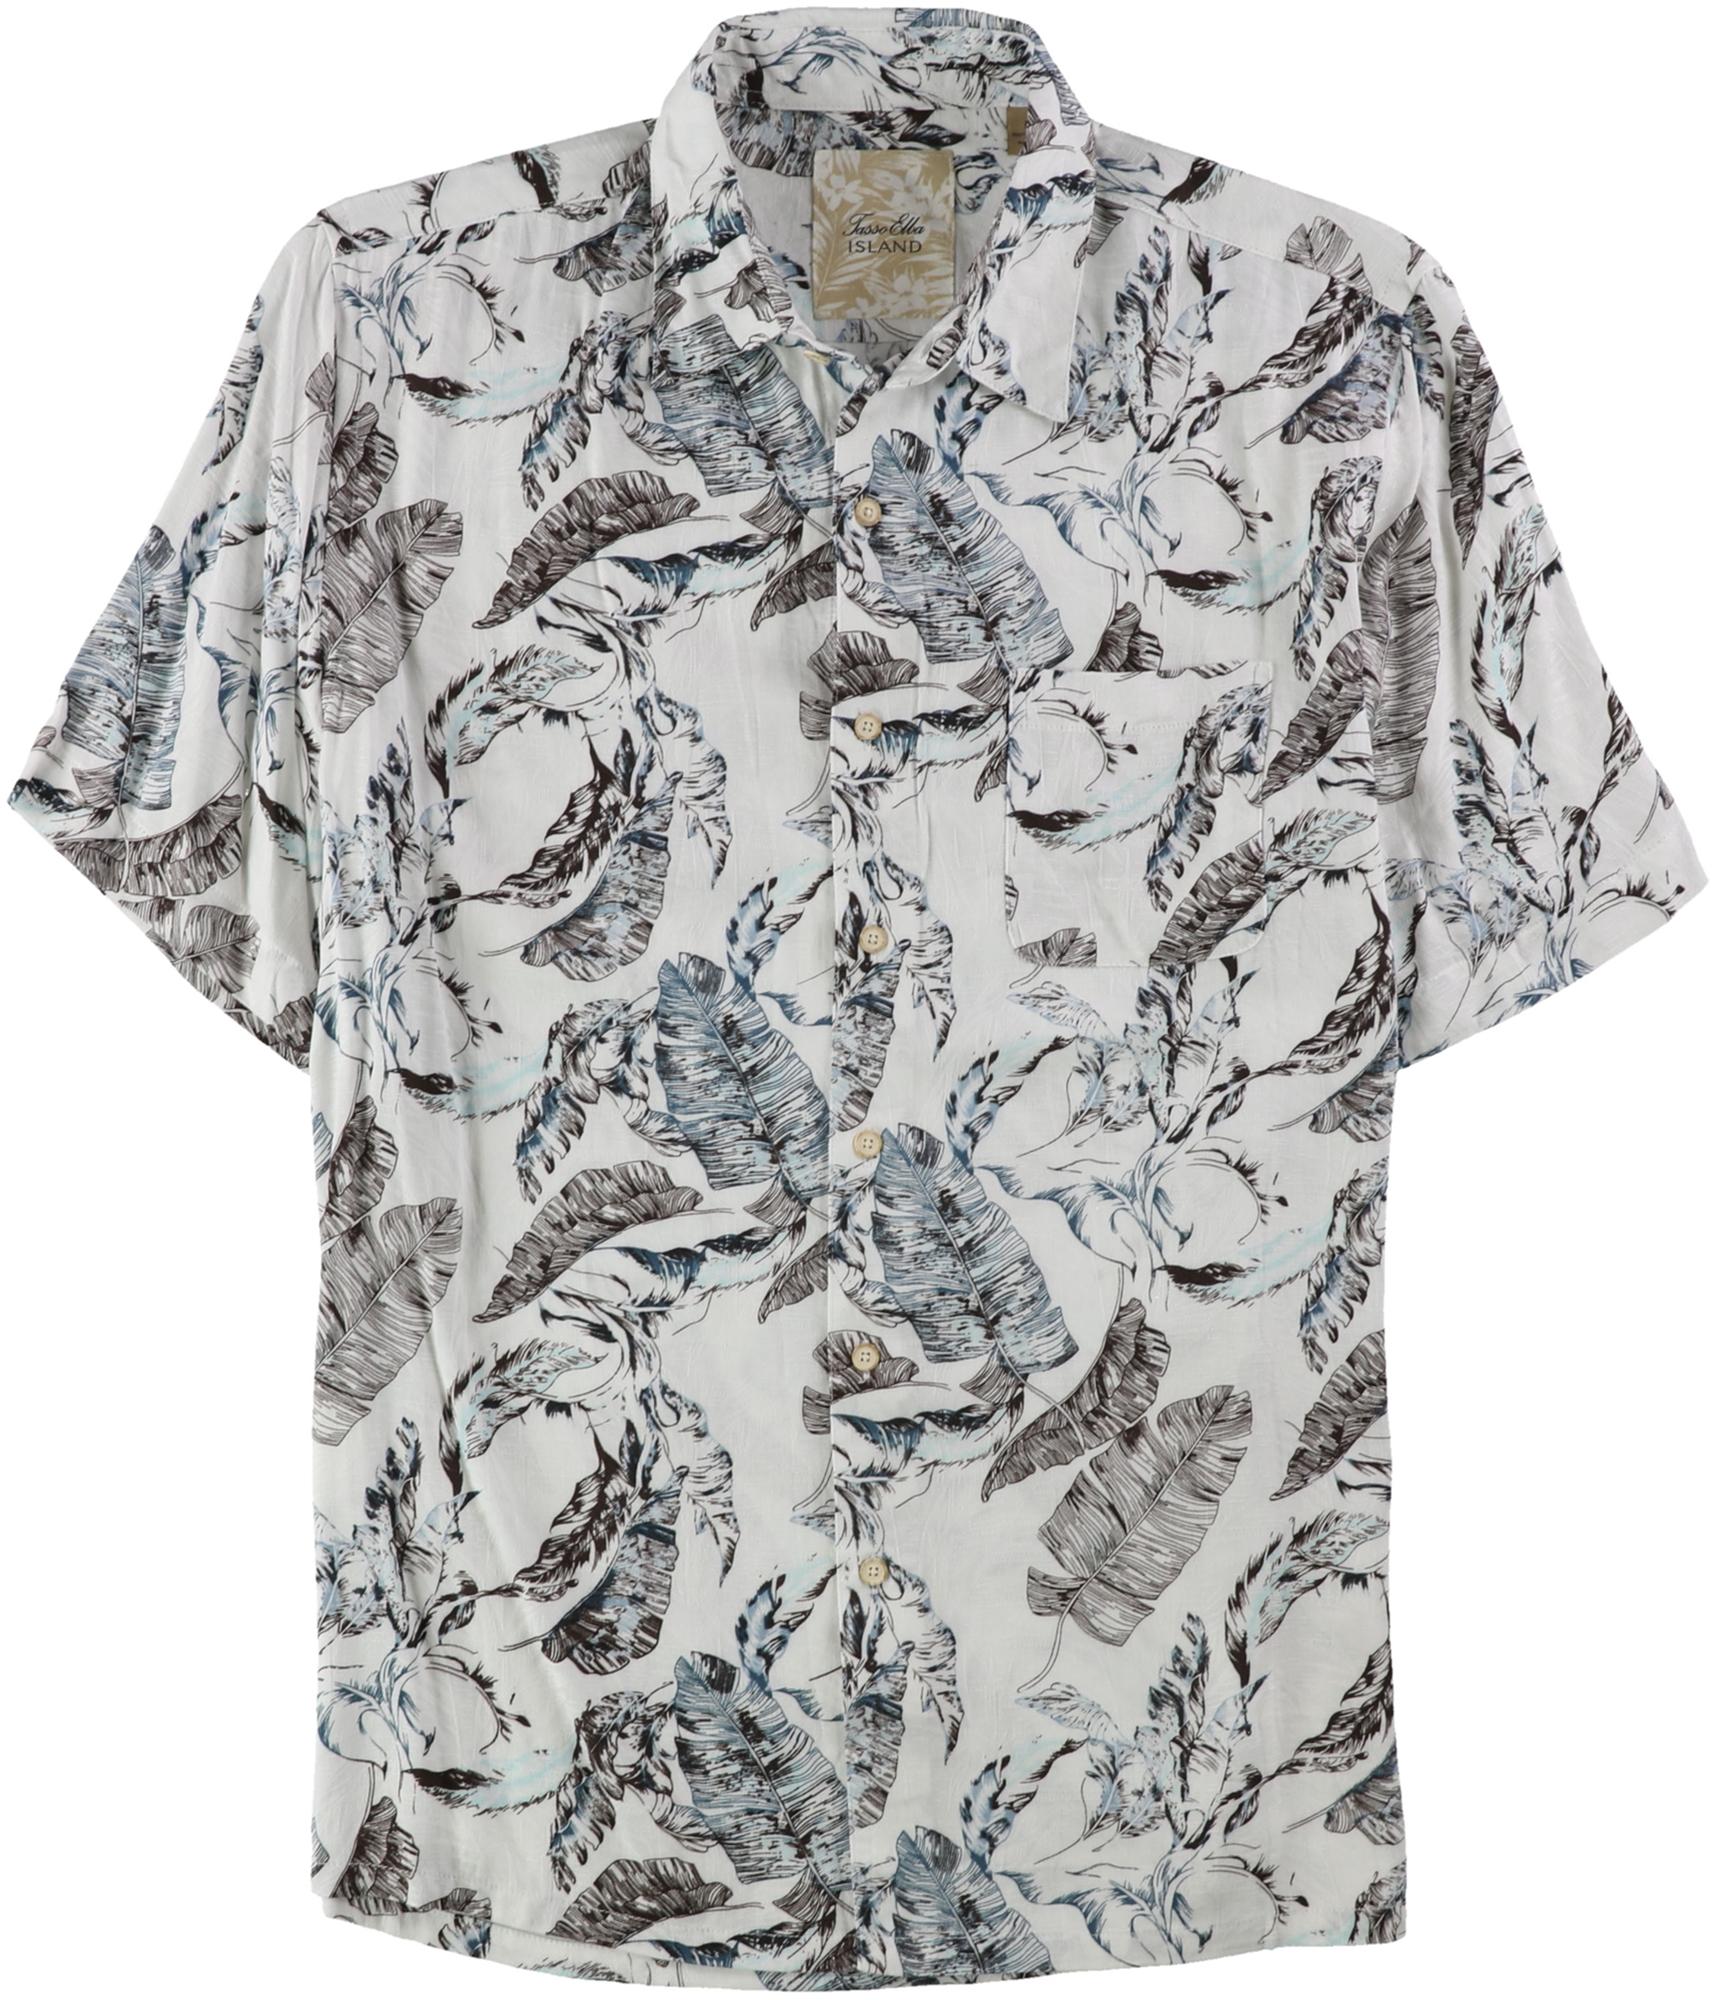 Tasso Elba Mens Floral Print Short Sleeve Silk Button Down Shirt Gray 2XL